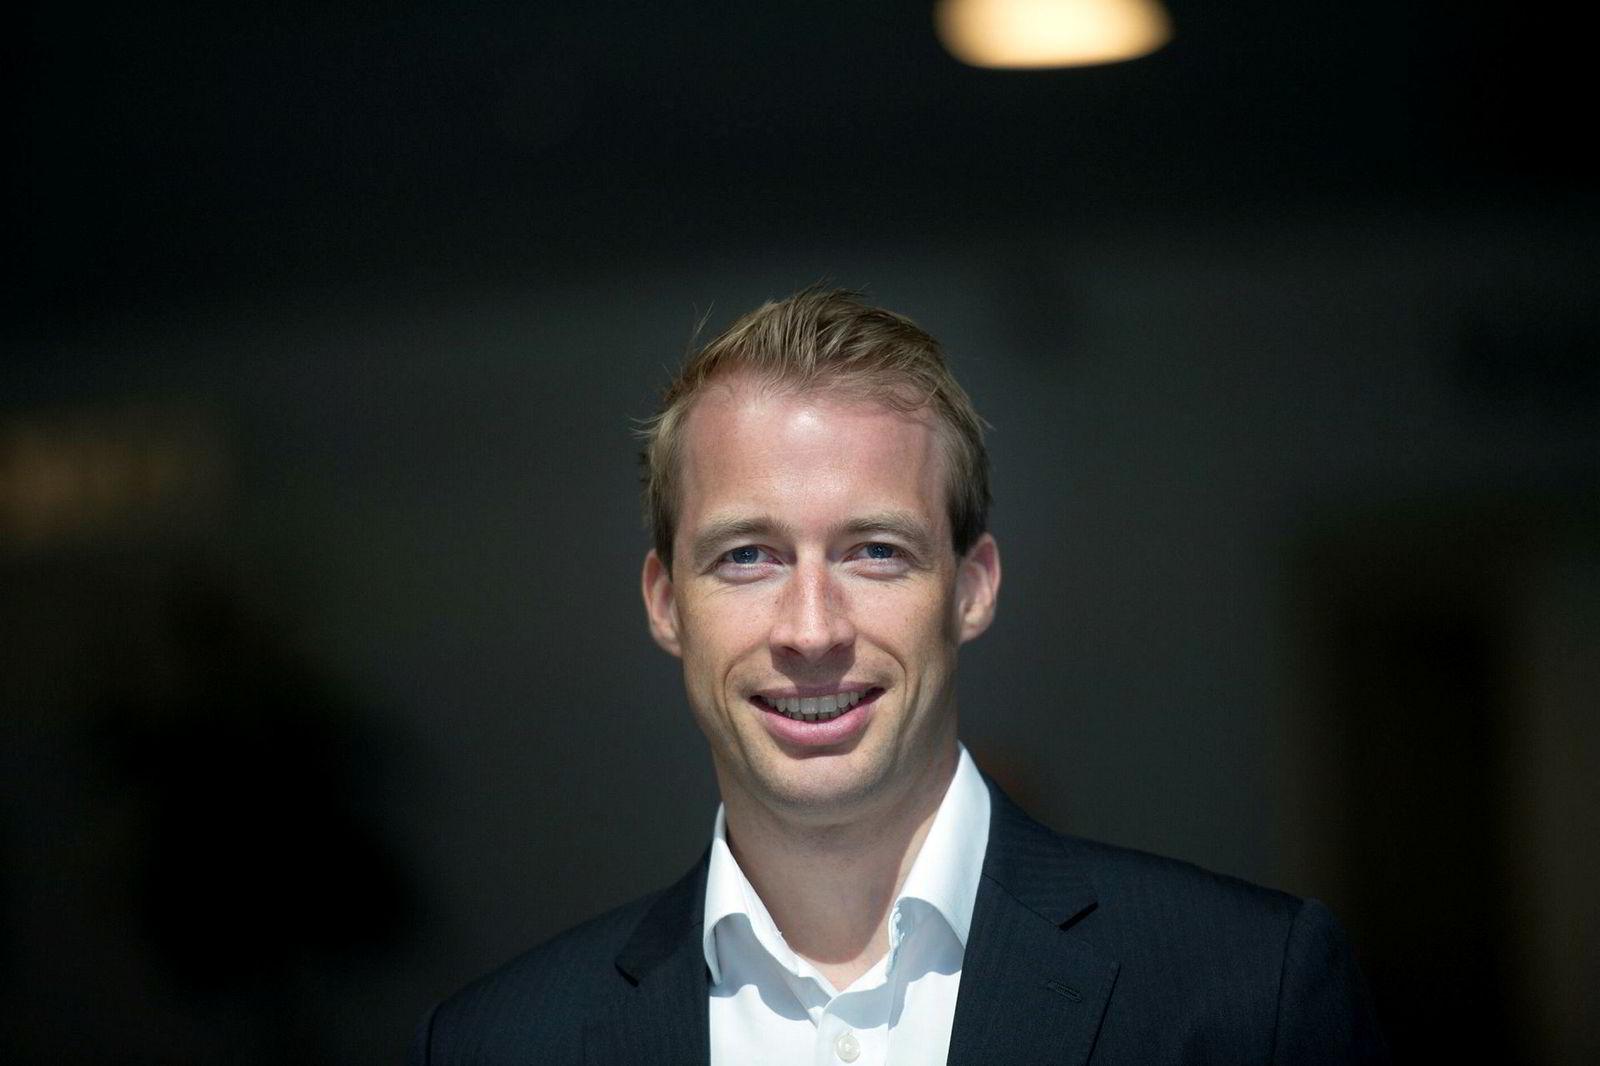 Teodor Sveen-Nilsen er oljeaksjeanalytiker i Sparebank 1 Markets.